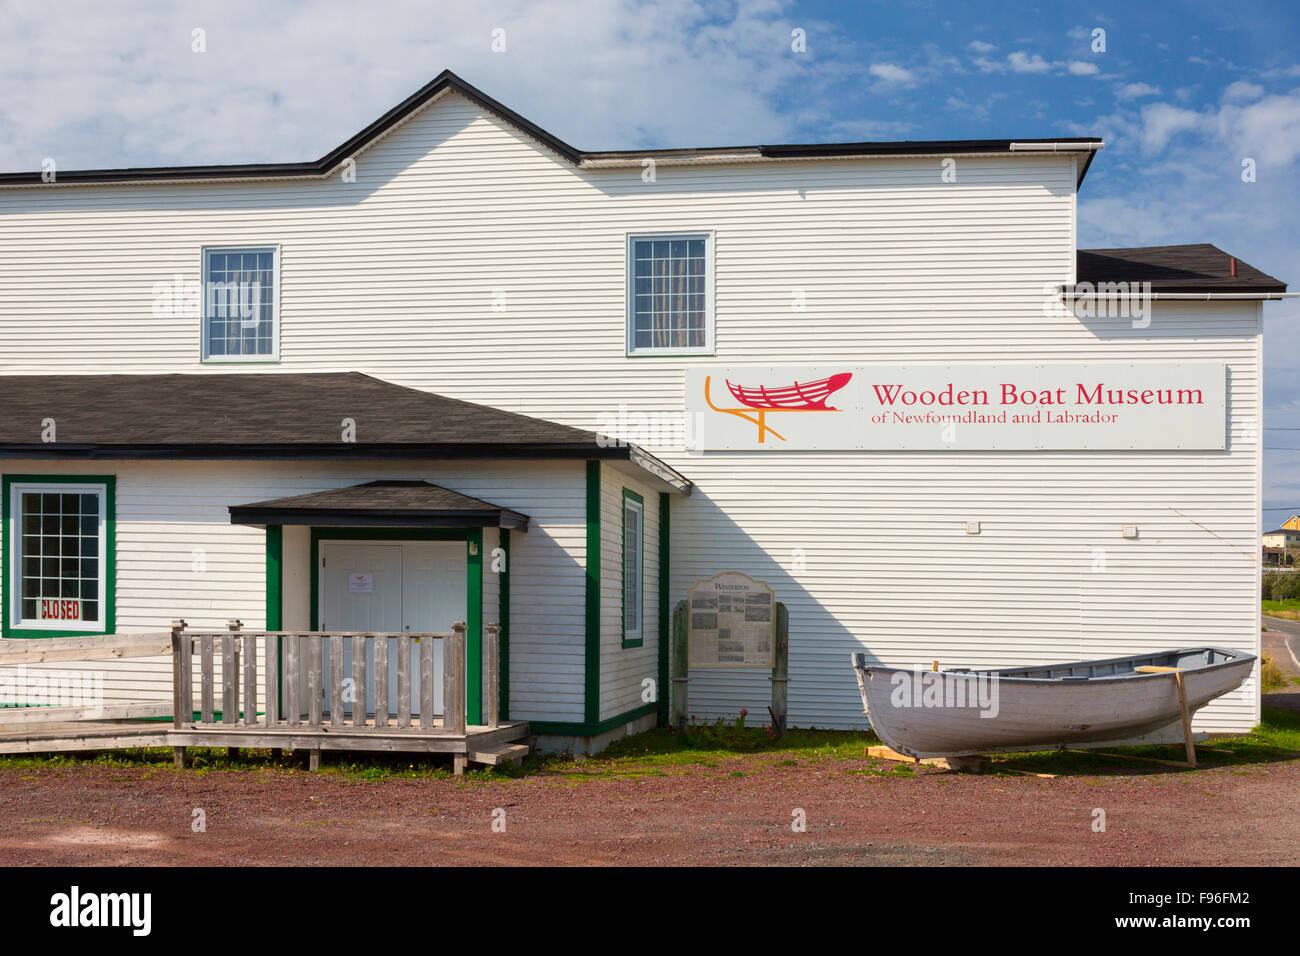 Wooden Boat Museum Winterton Newfoundland Canada Stock Photo